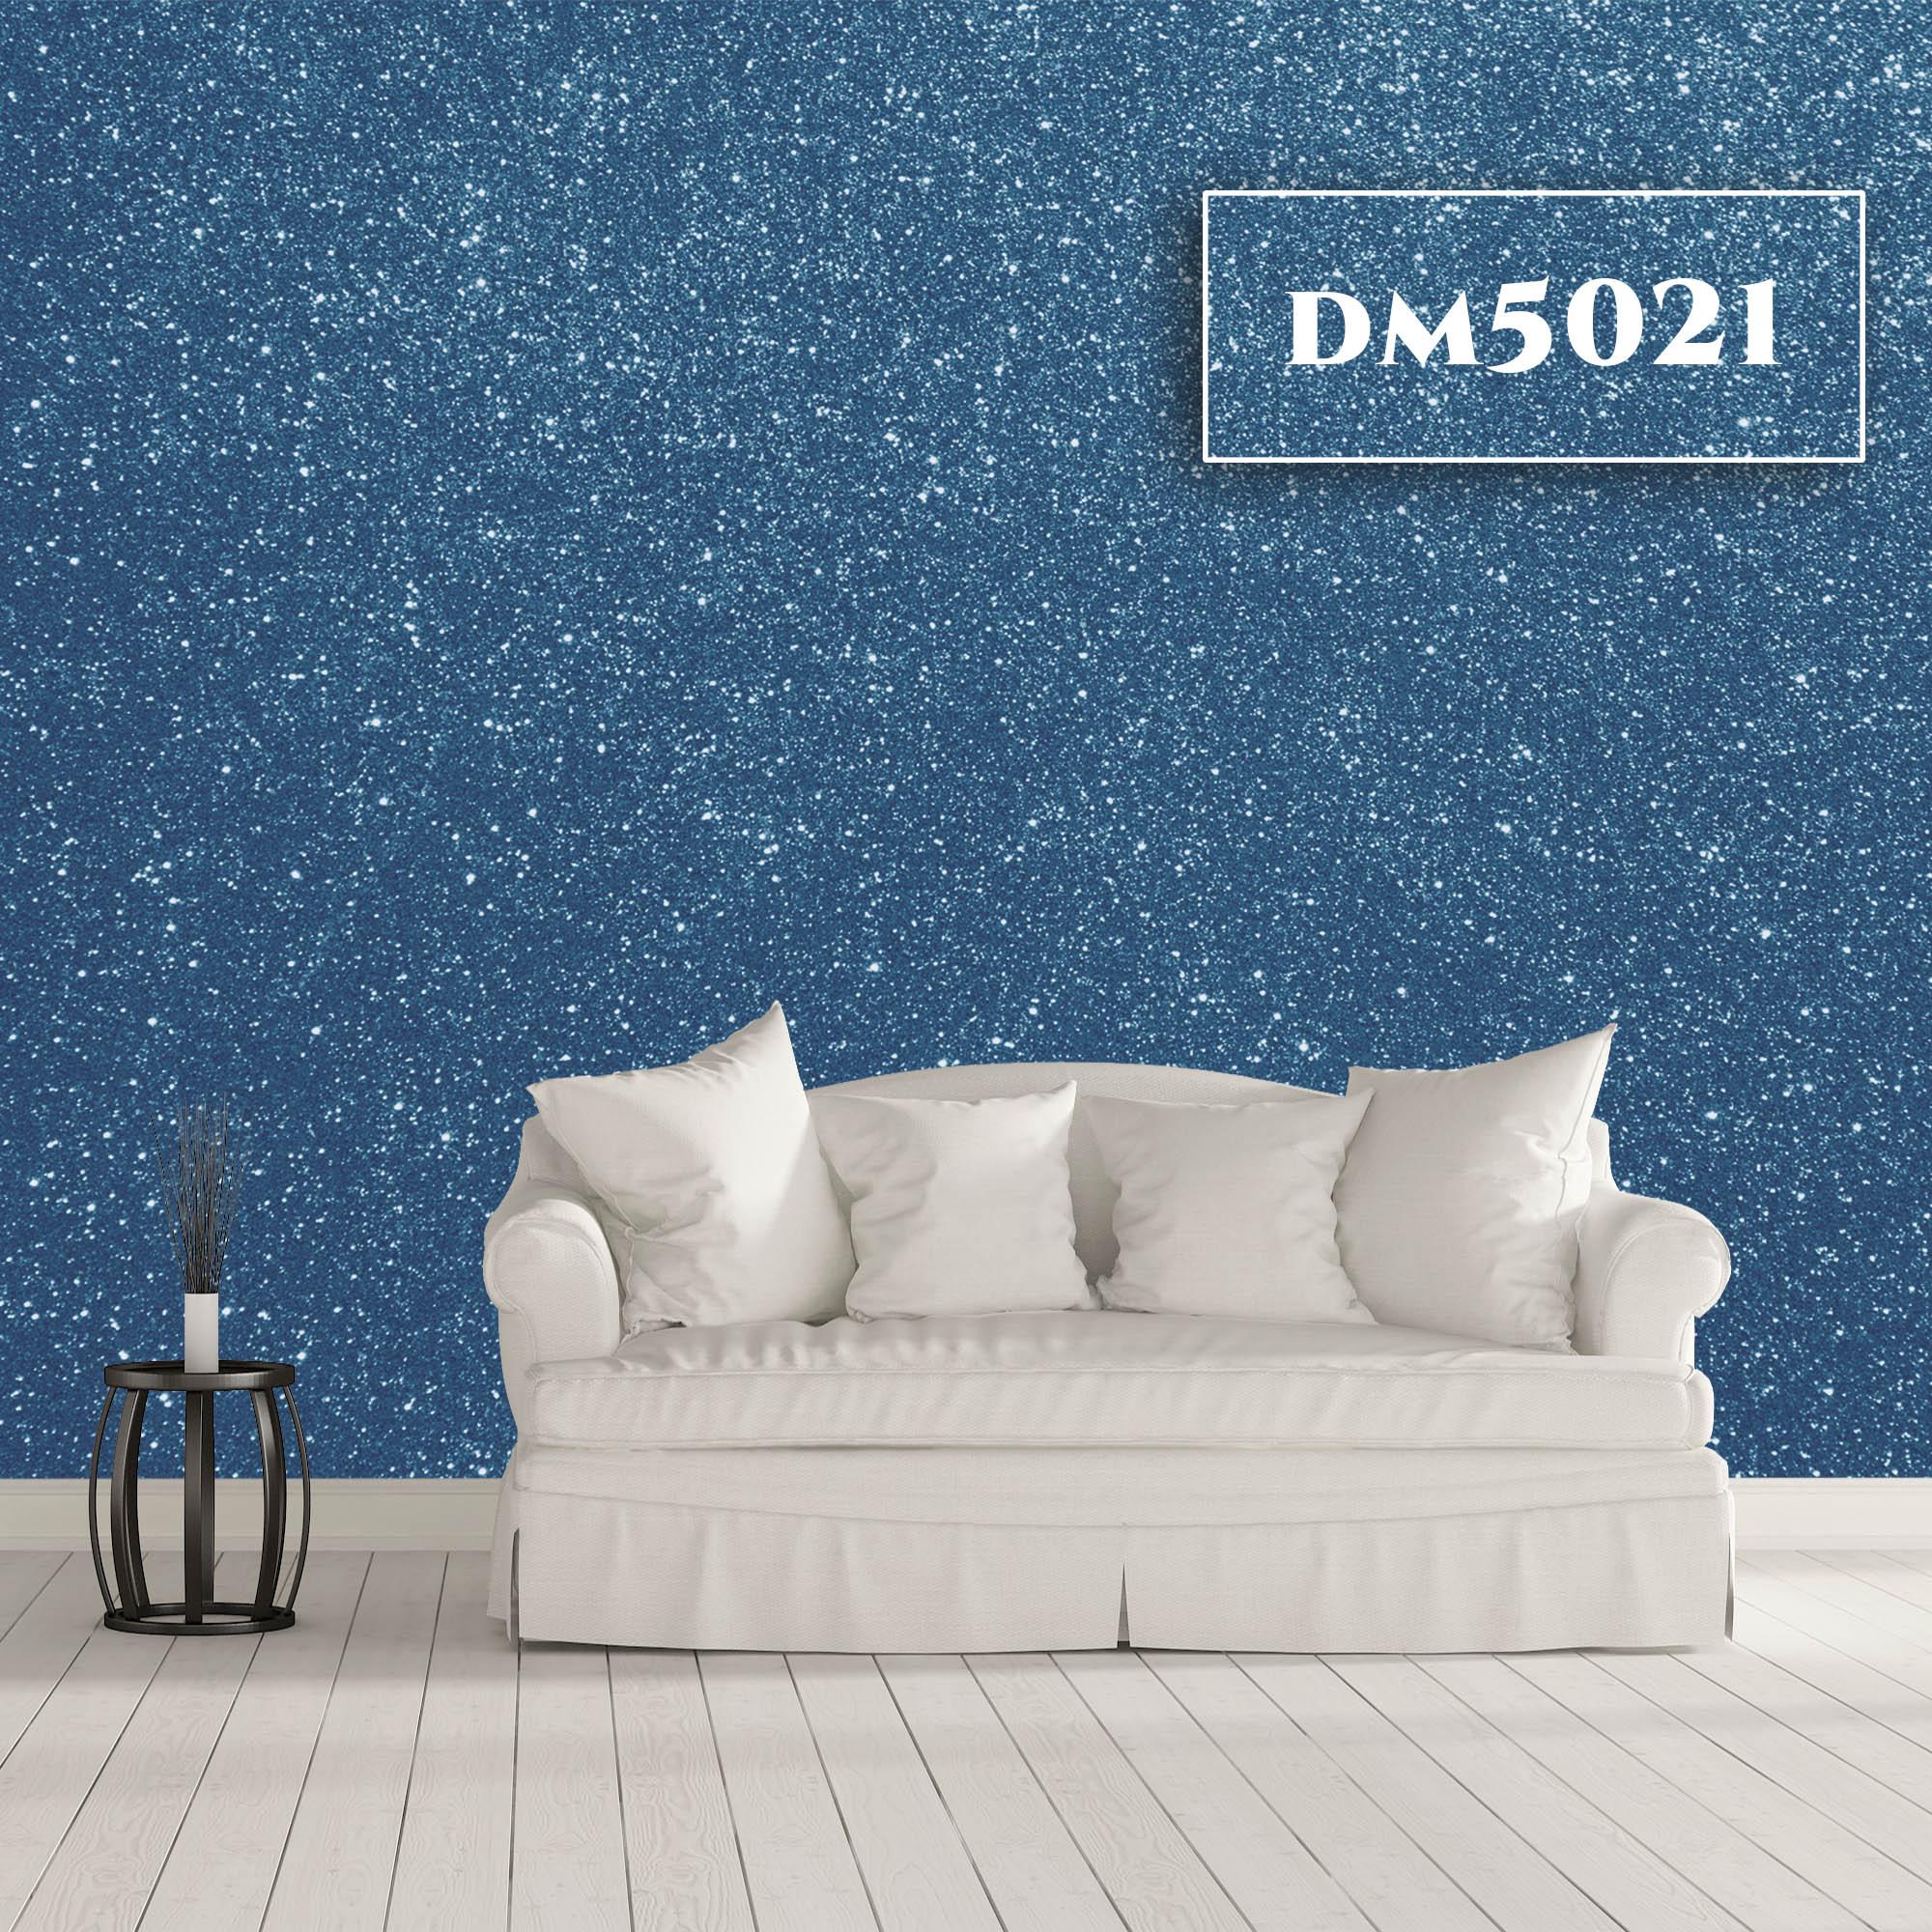 DM5021